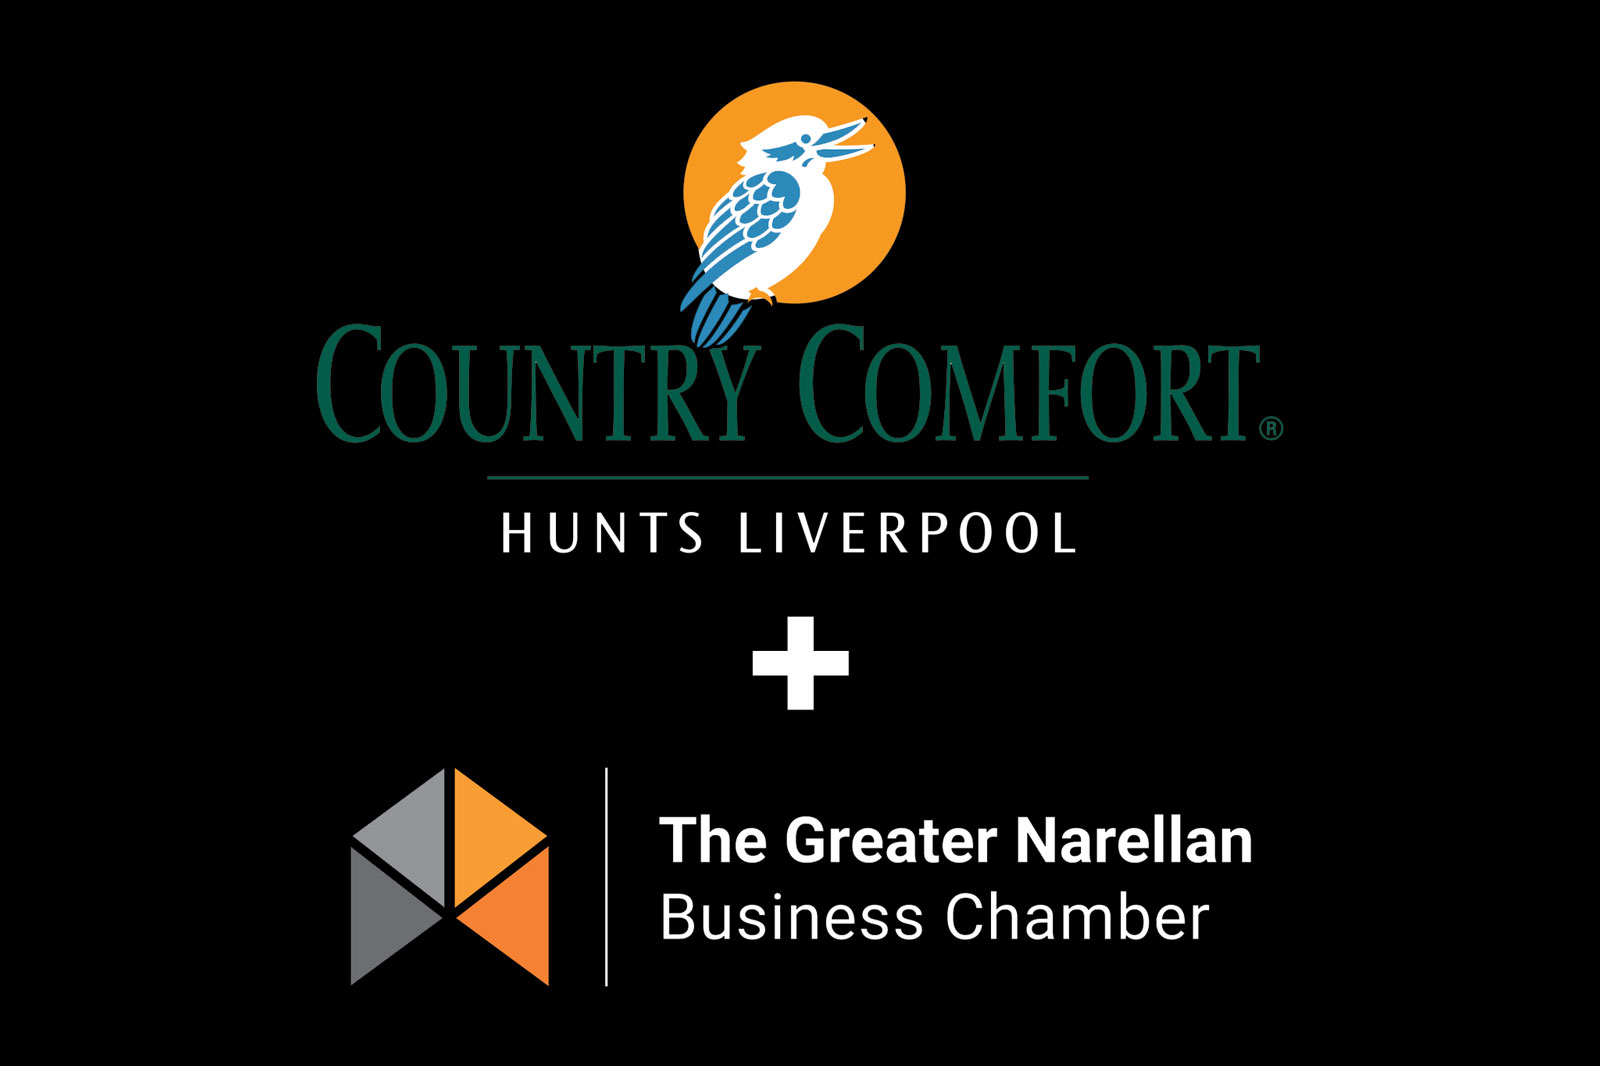 Greater Narellan Business Chamber Sponsorship